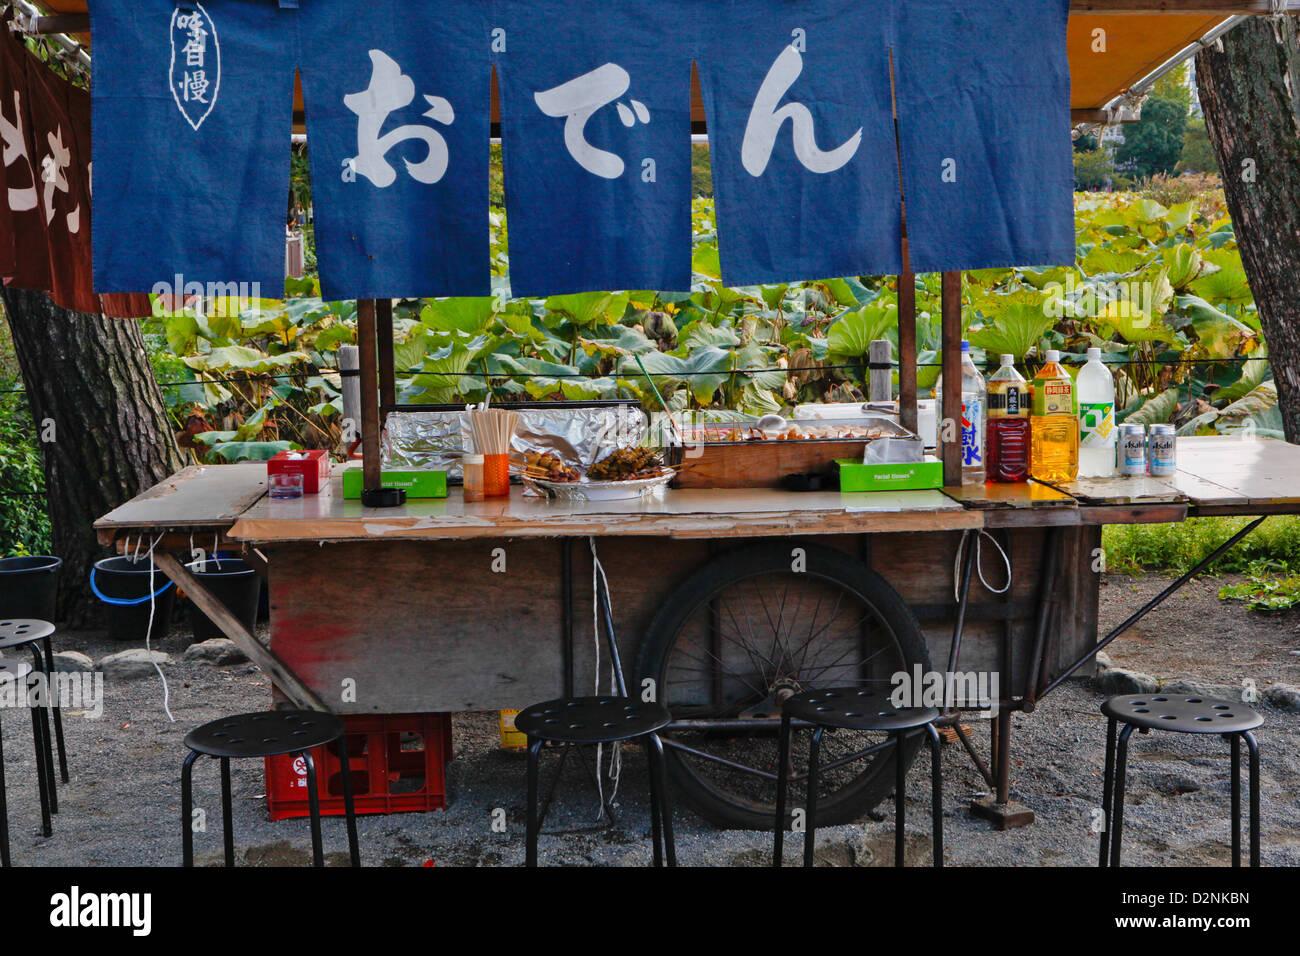 portable luncheon vendor, Tokyo - Stock Image